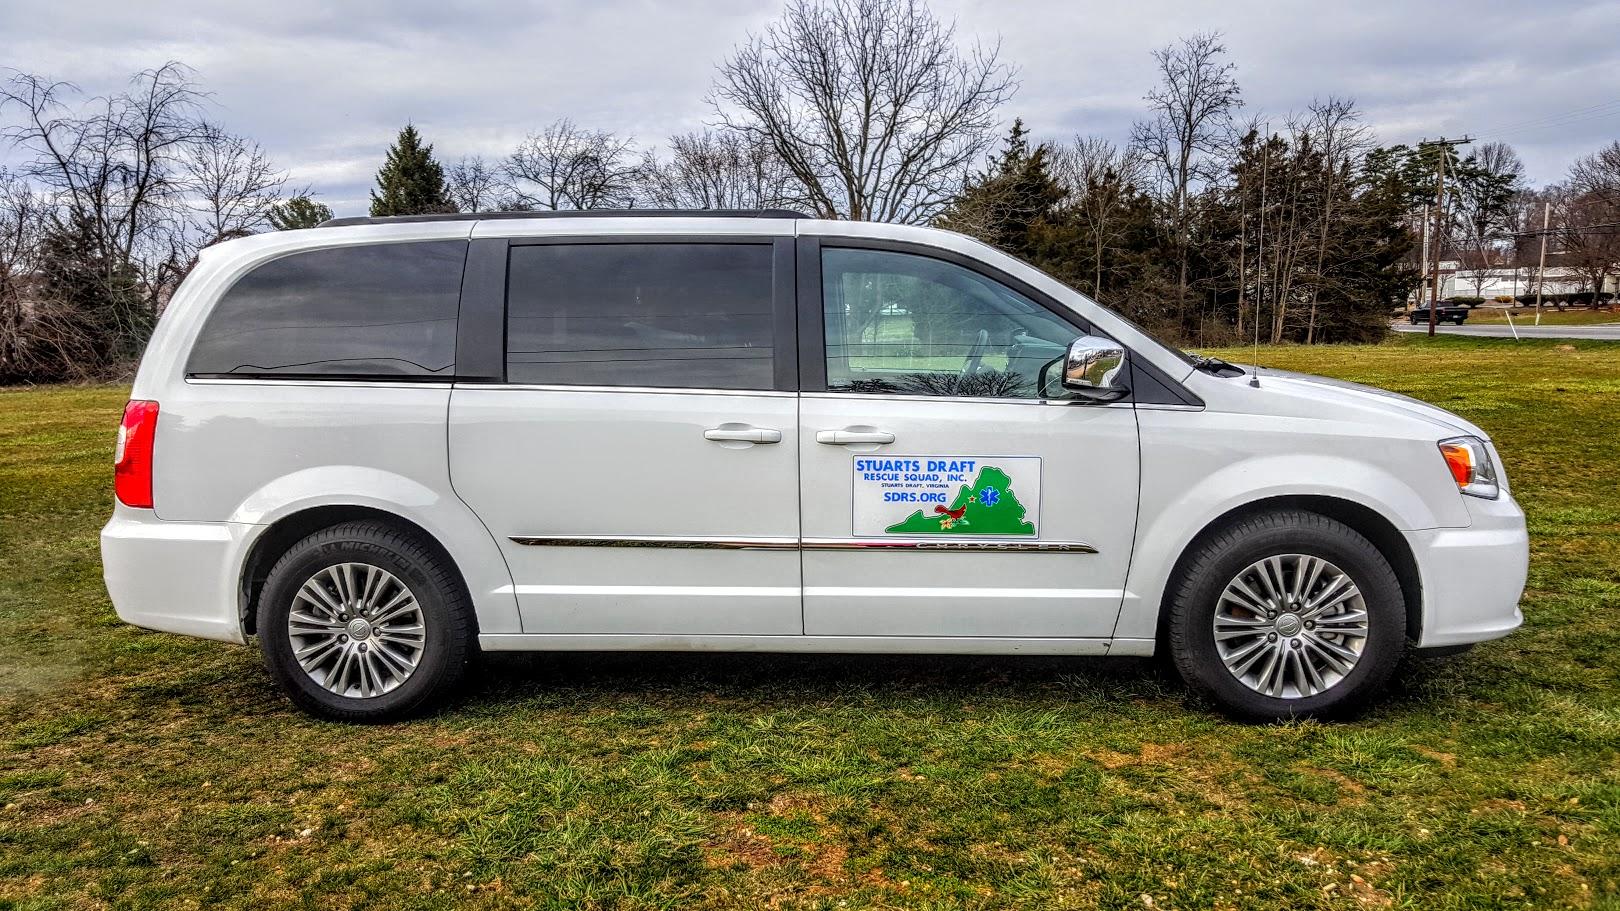 Minivan (Non-Emergency, General Transportation)